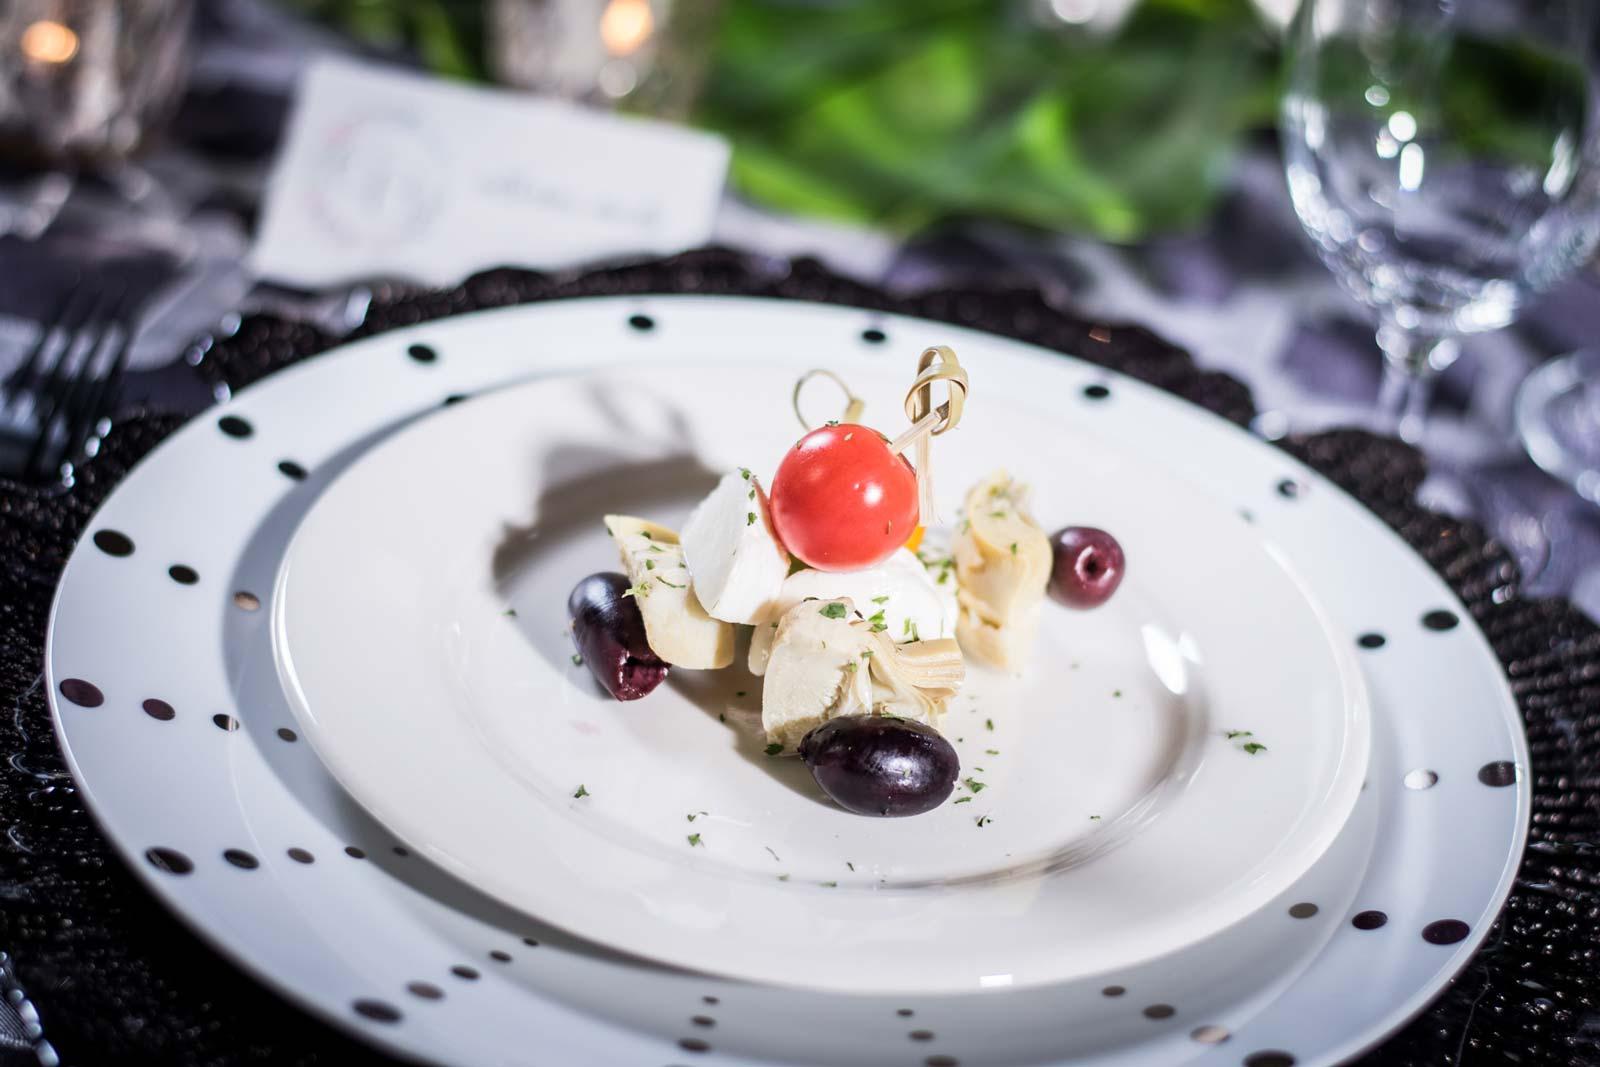 Elegant Tapas Dish